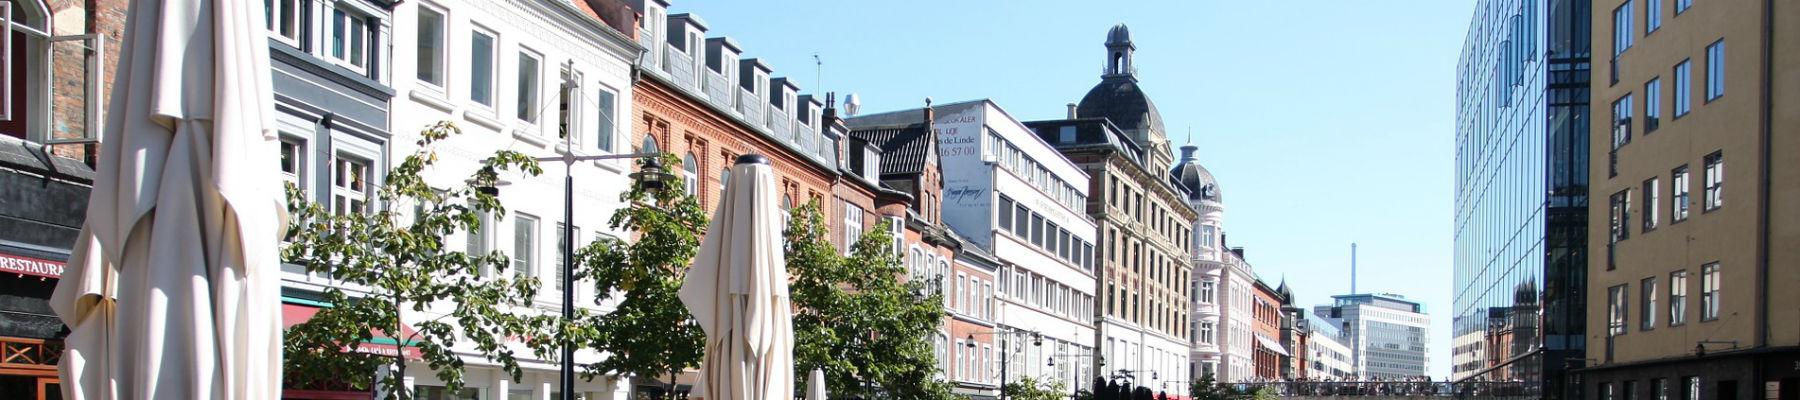 Ejerlejlighed Århus